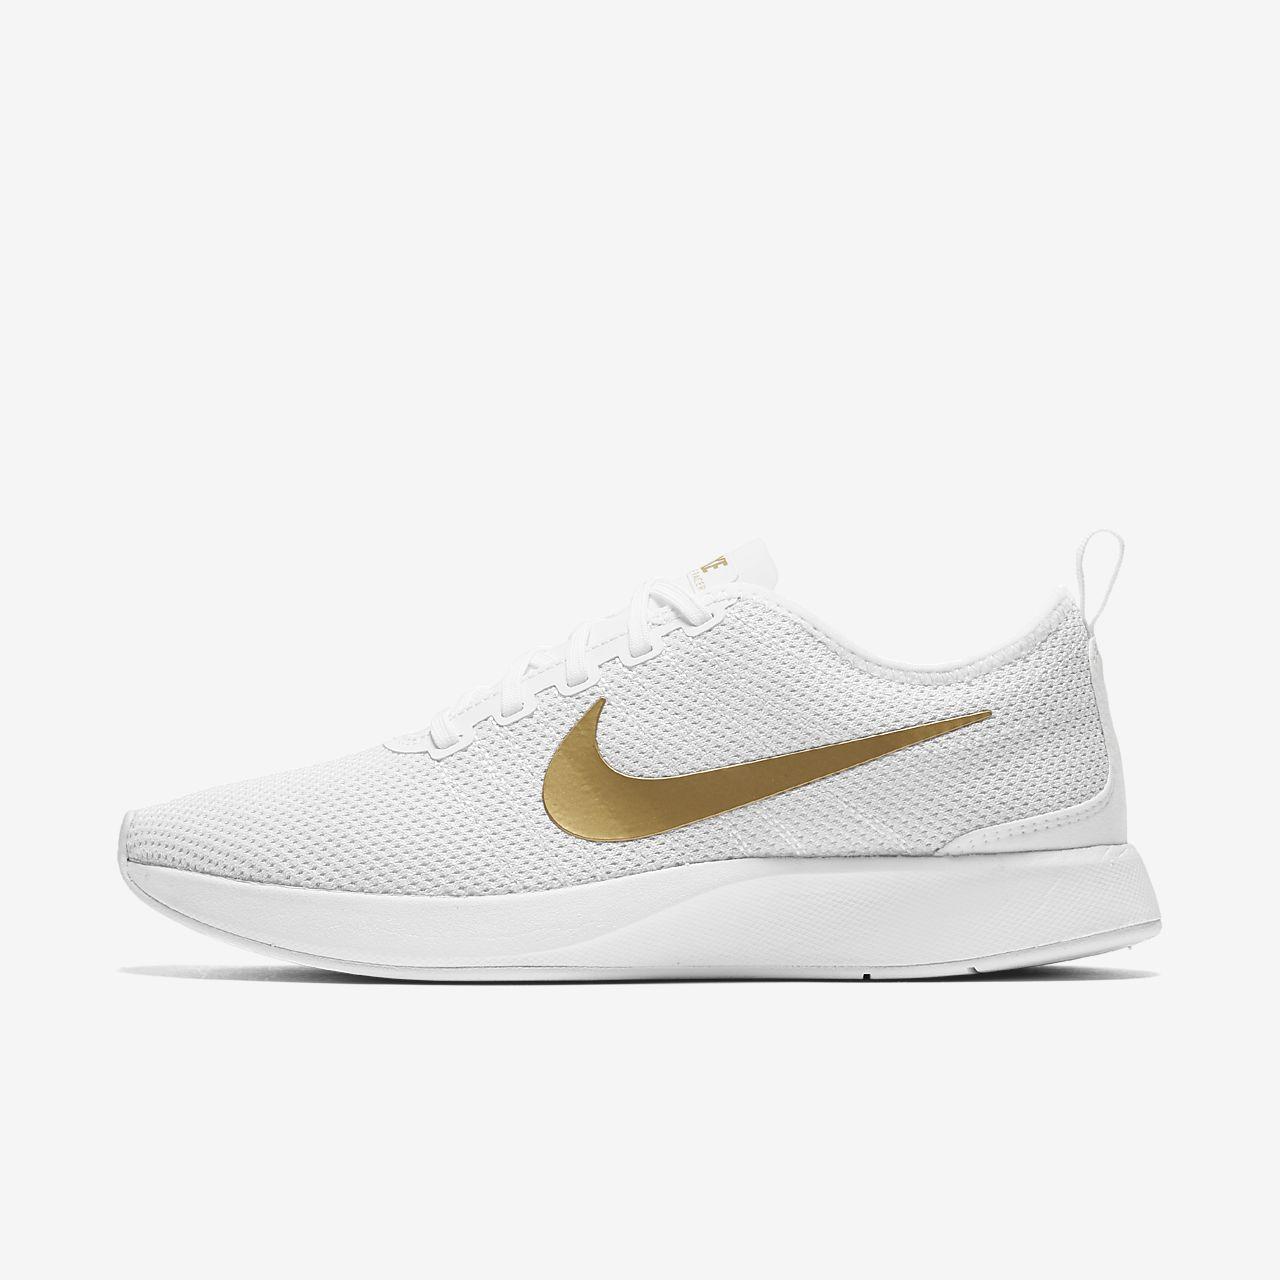 Nike Chaussures Double Racer Ton Gris Blanc vpJZL1L